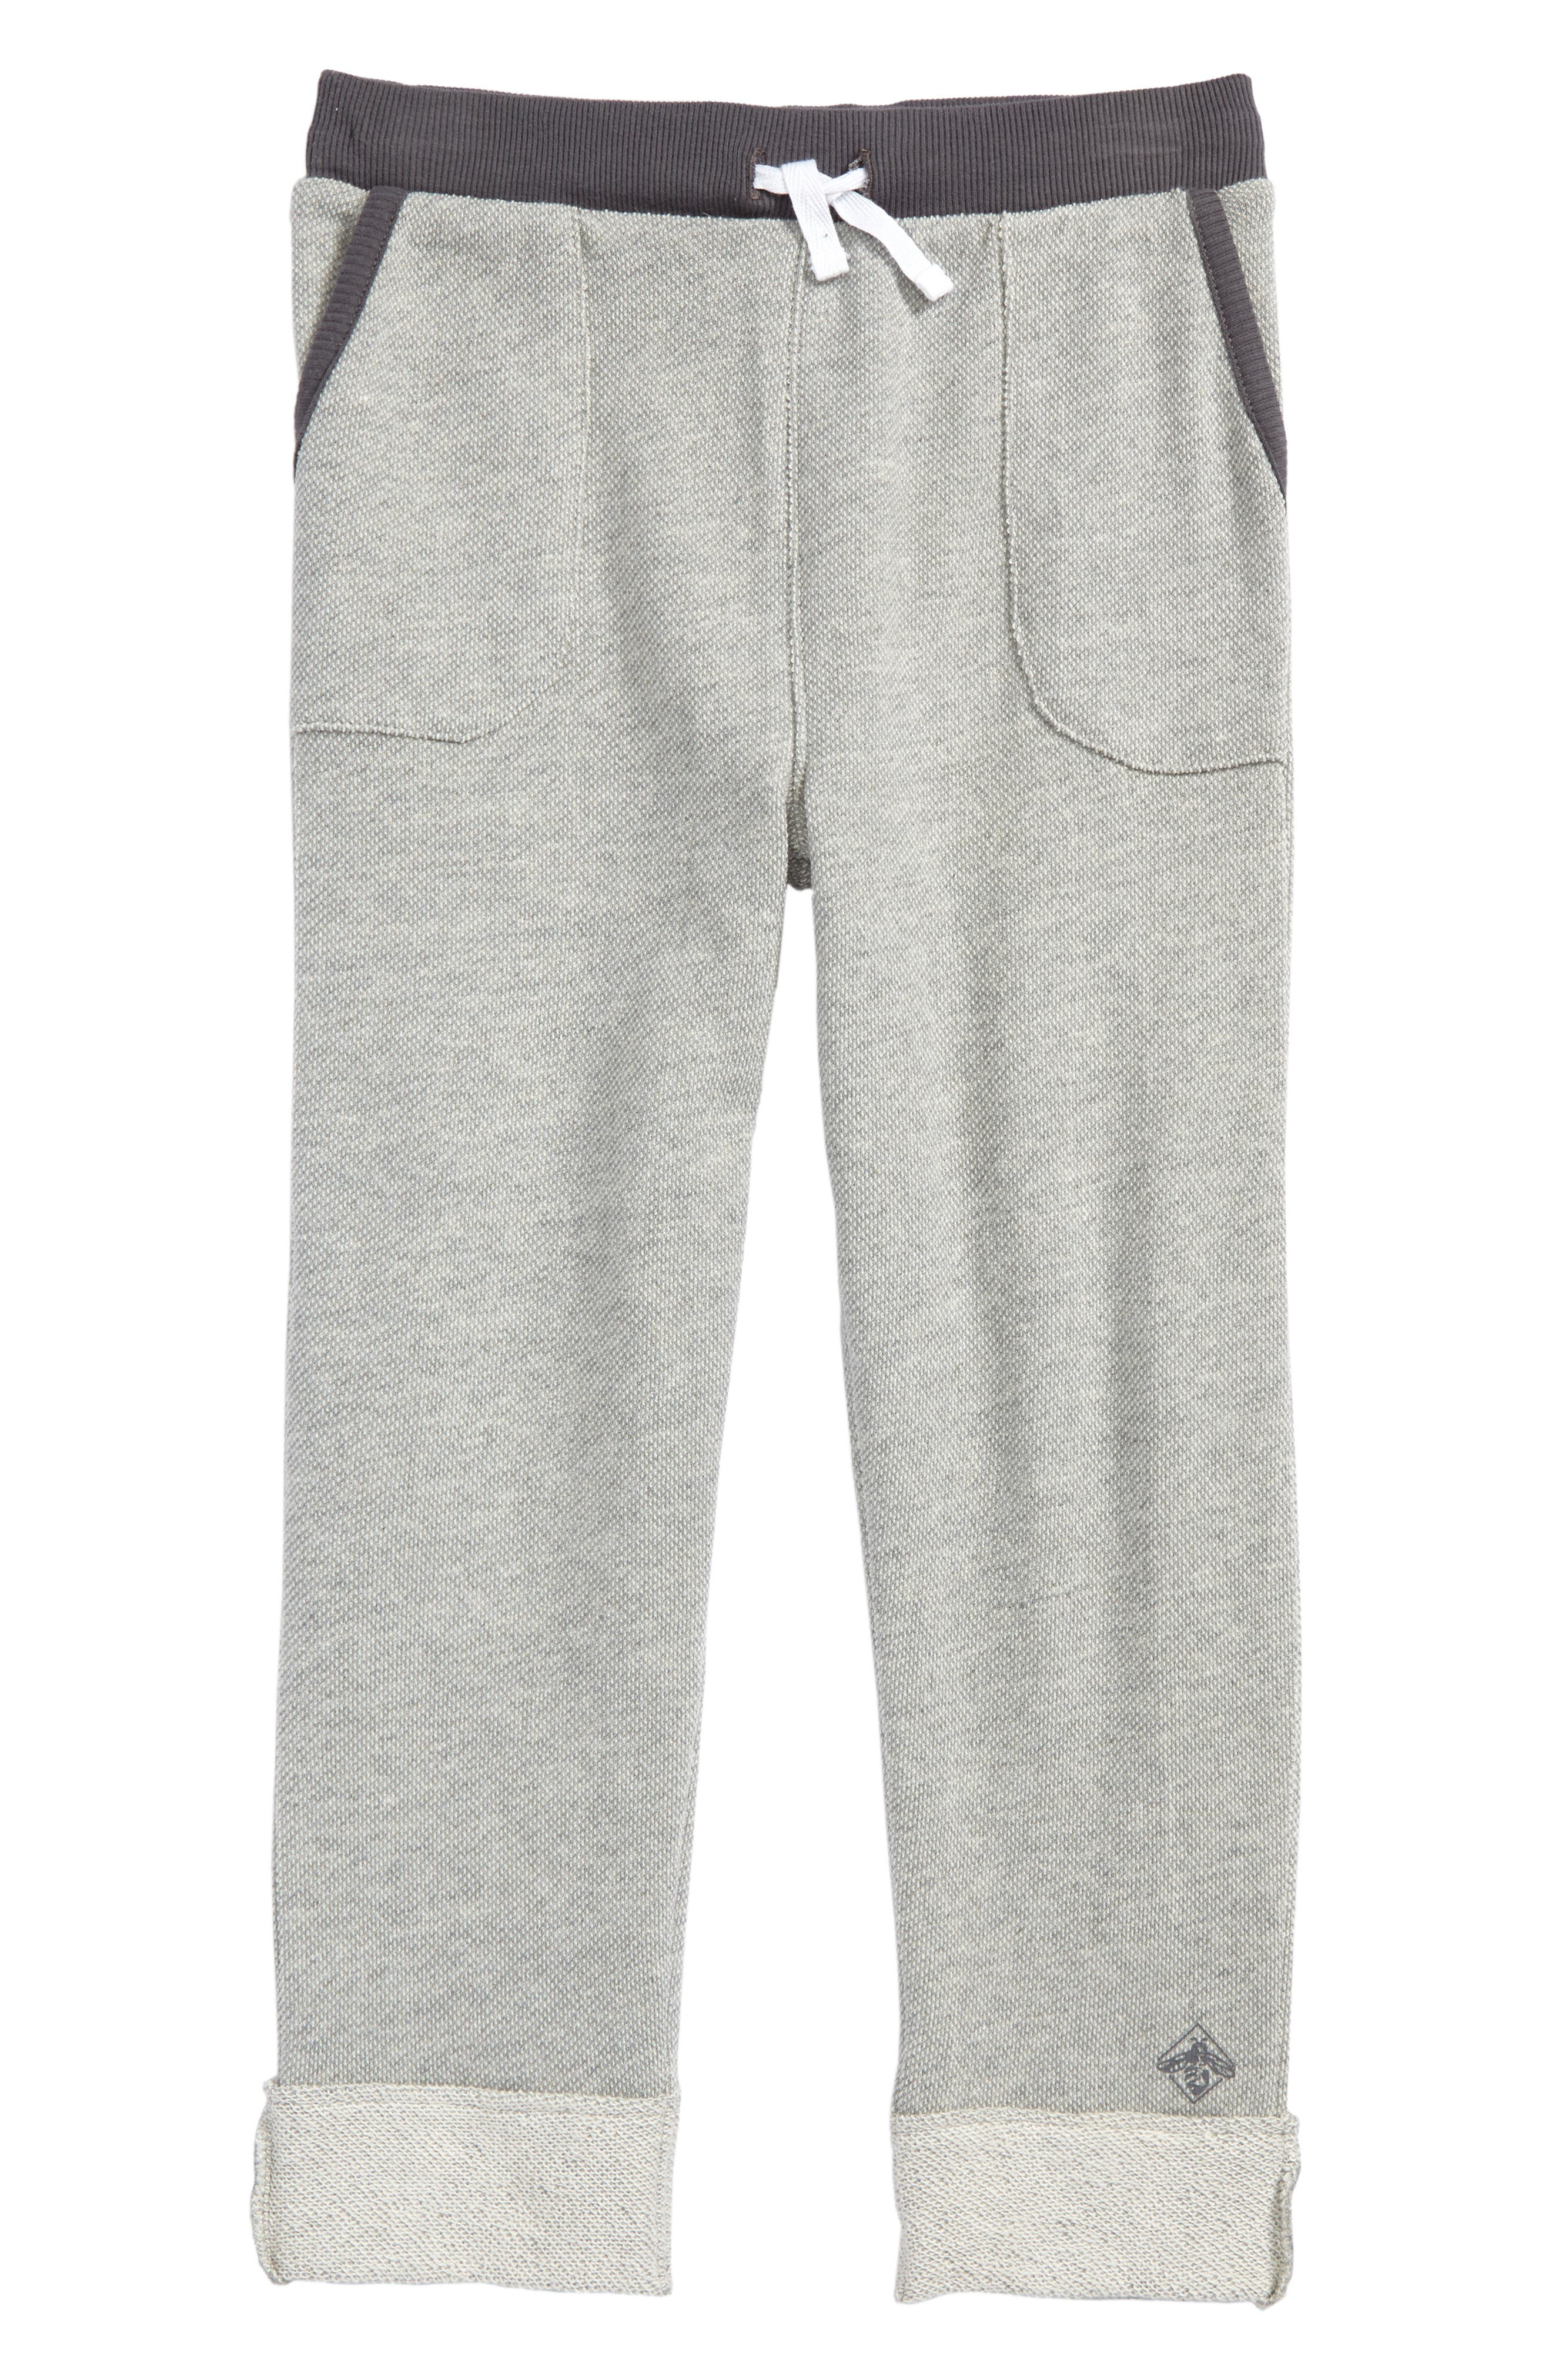 Organic Cotton Sweatpants,                         Main,                         color, Heather Grey